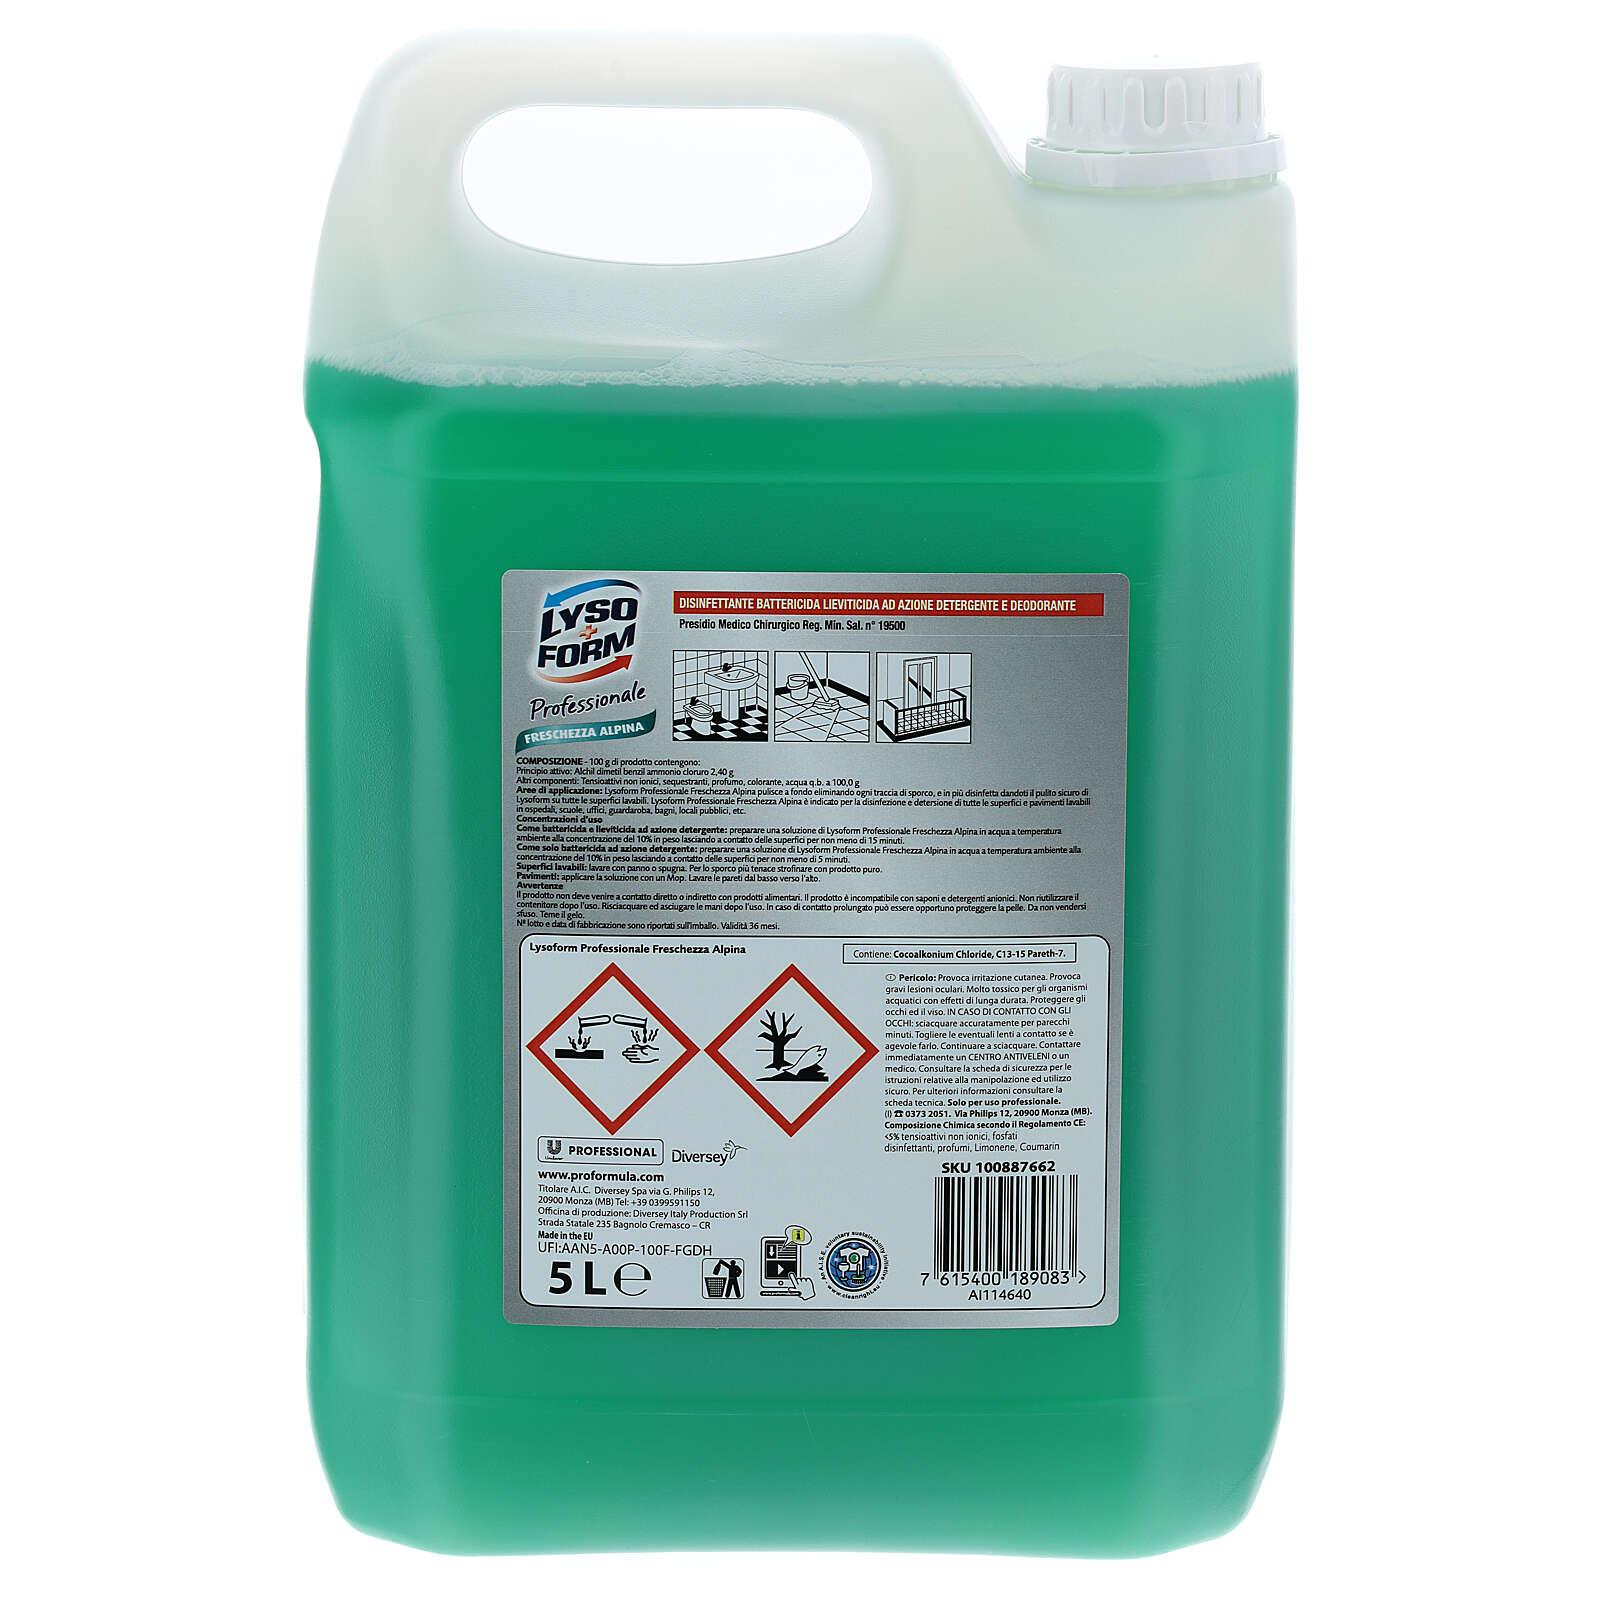 Tanica detergente Pro Formula Lysoform 5 litri 3